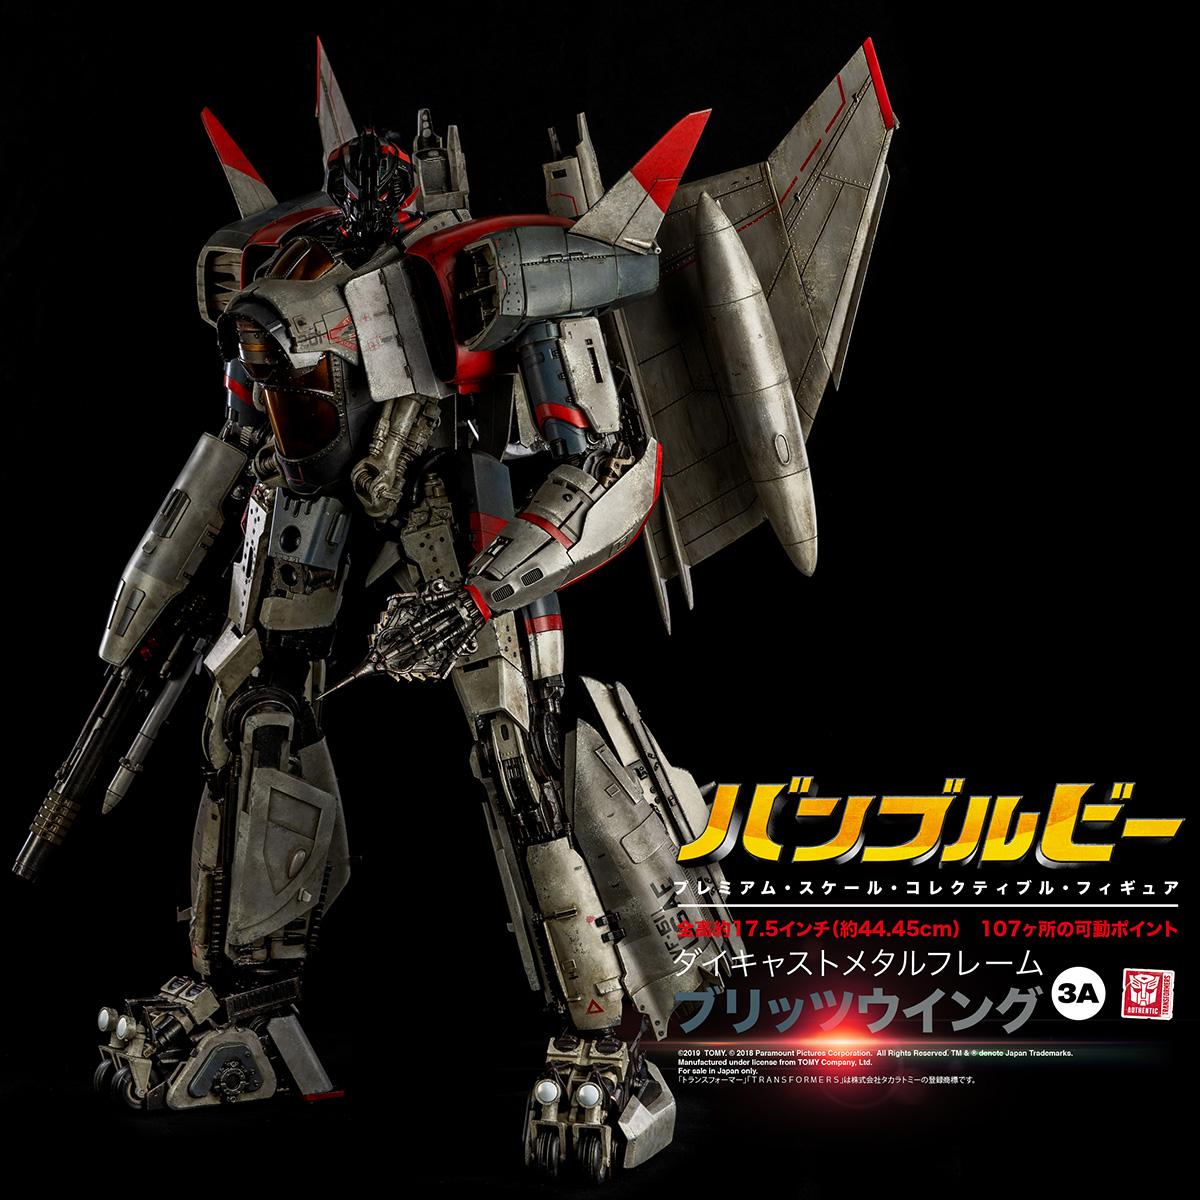 Blitzwing_PM_JAP_1019.jpg